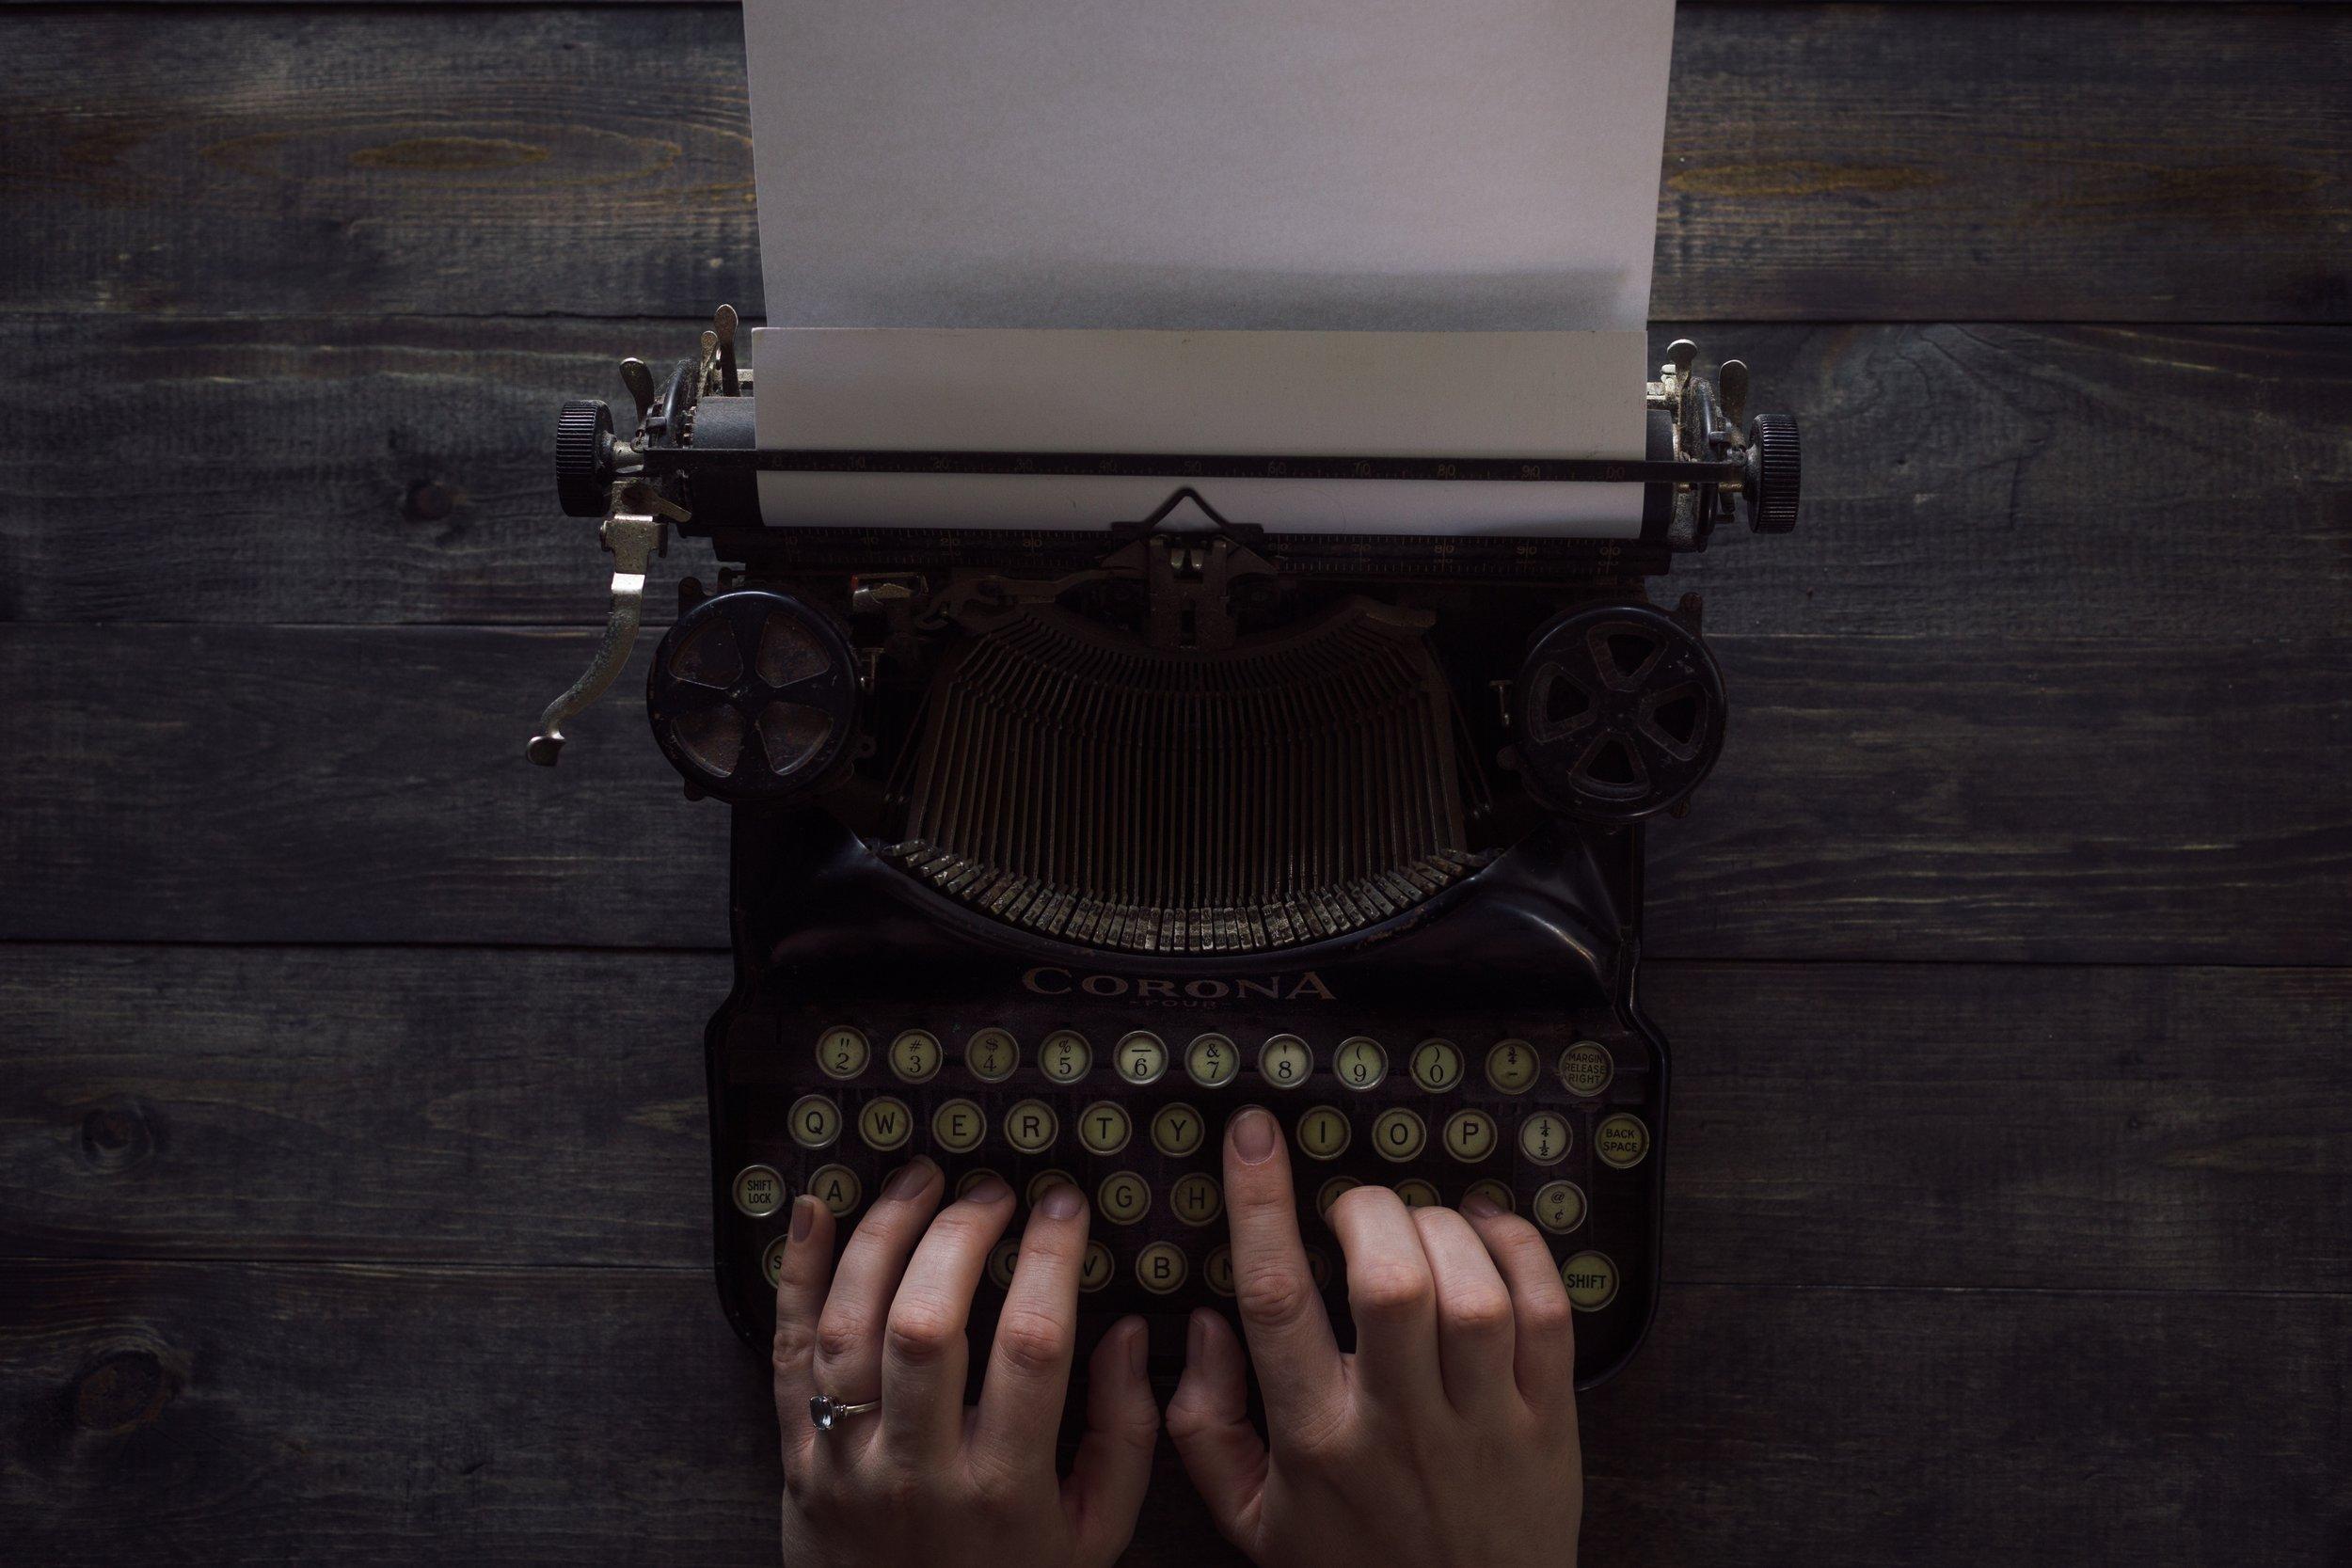 Writing Fundraising Letter on Typewriter